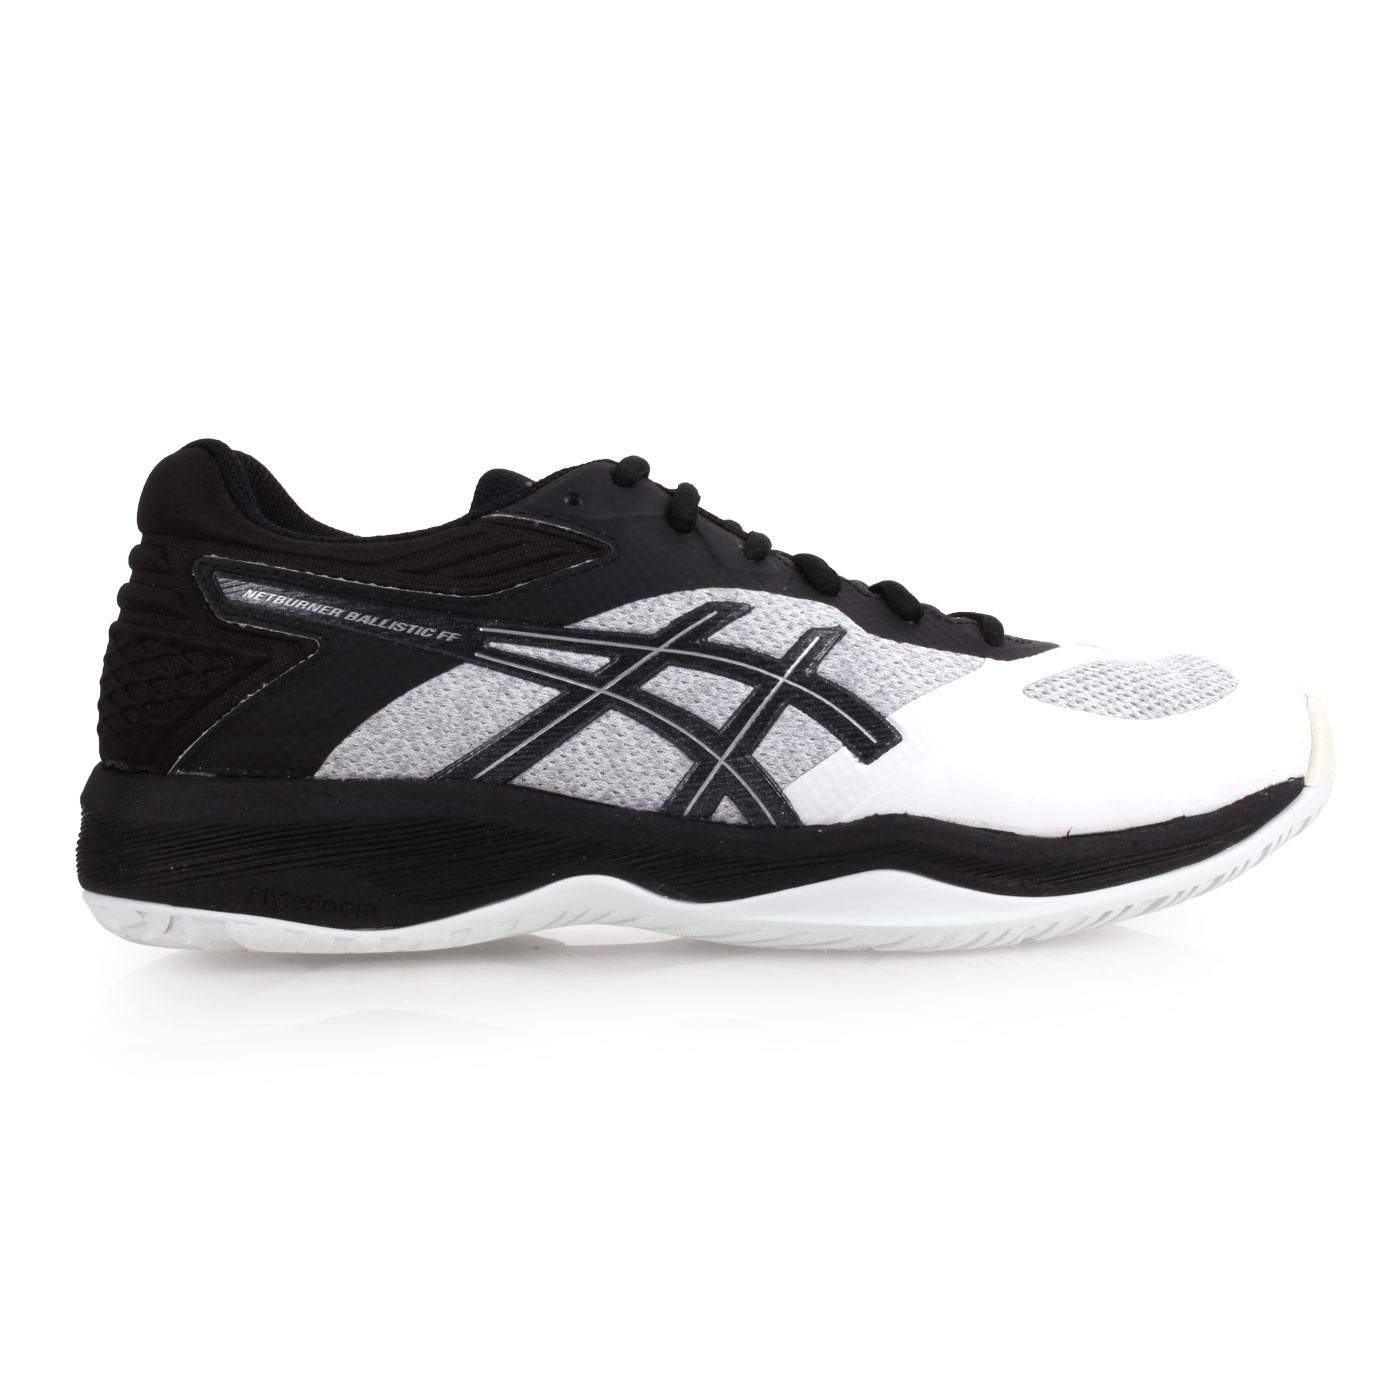 ASICS 排羽球鞋  @NETBURNER BALLISTIC FF@1051A002-100 - 白灰黑